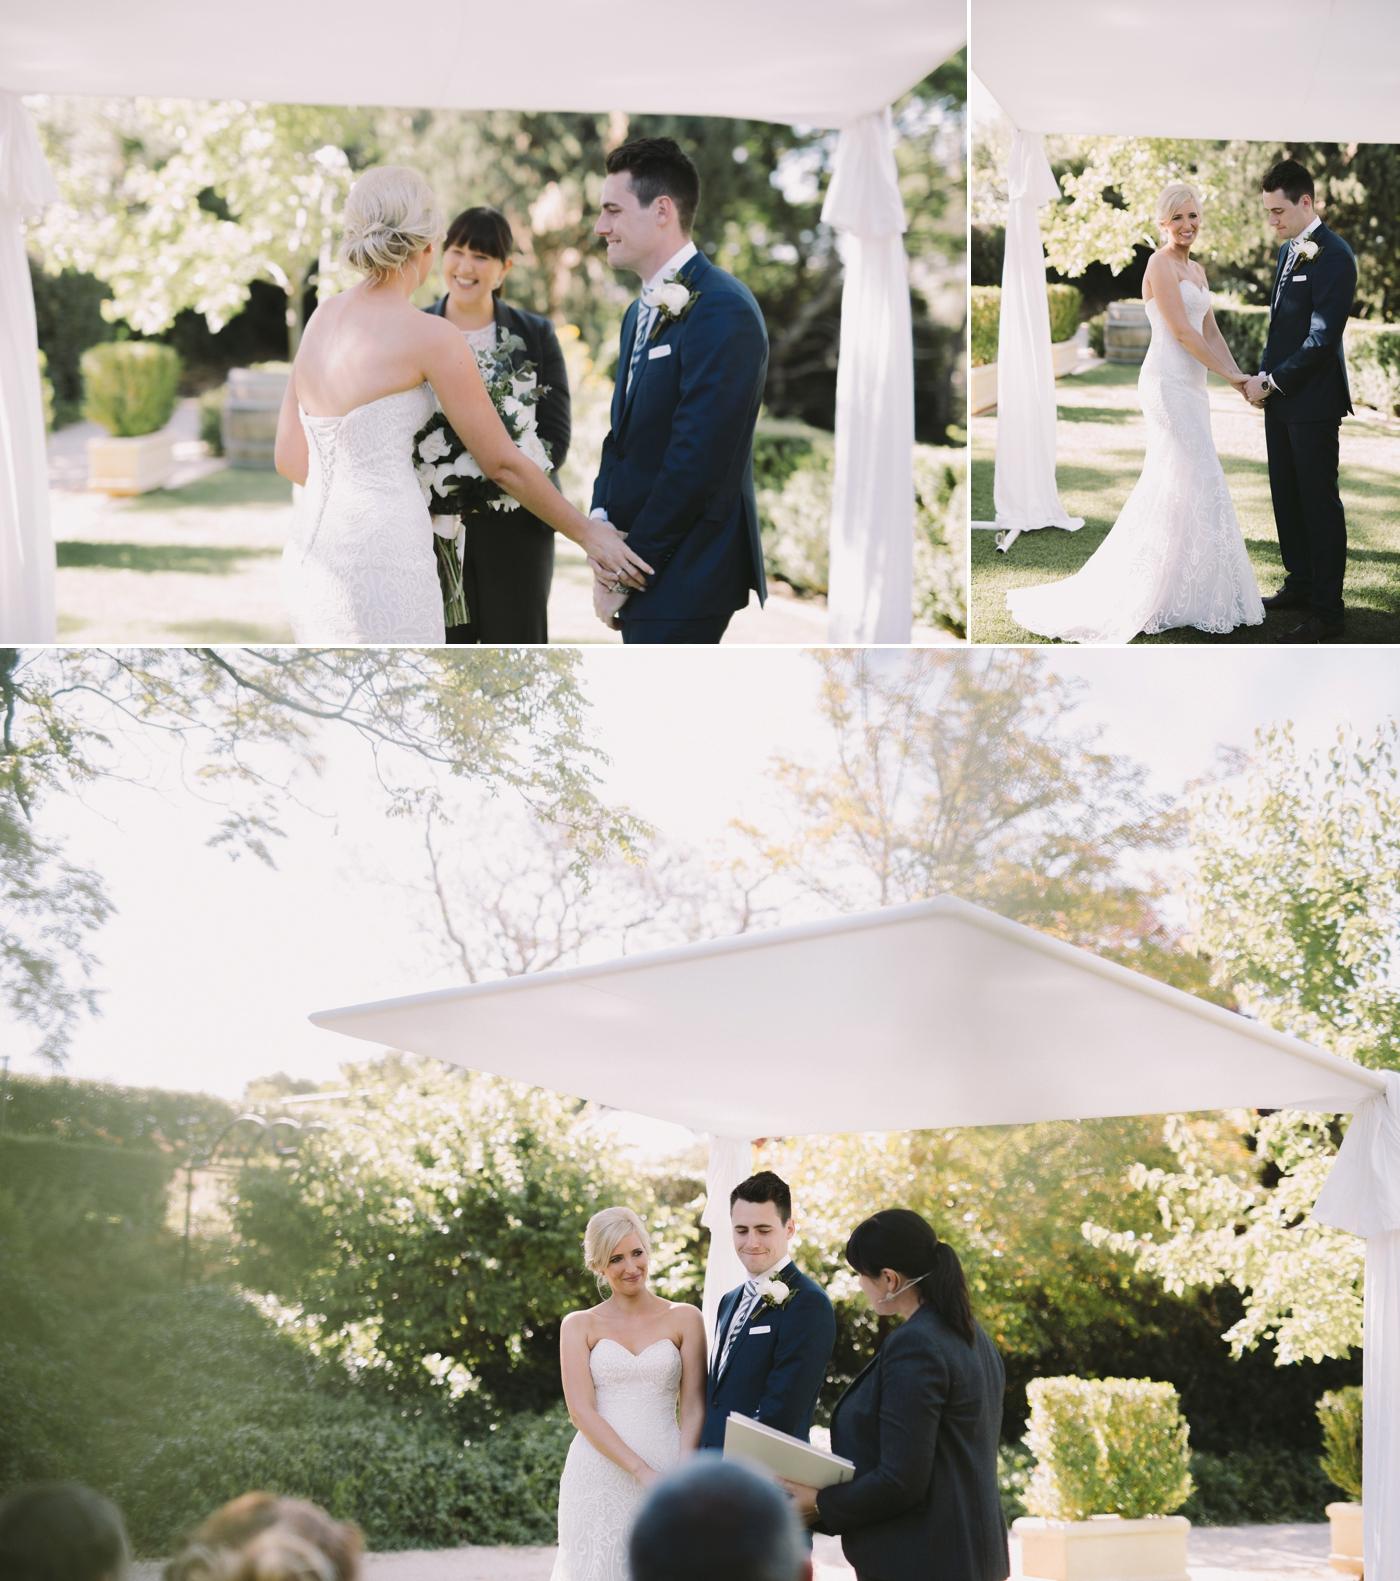 Lauren & Max - Marybank Estate Wedding - Natural wedding photographer in Adelaide - www.katherineschultzphotography.com 60